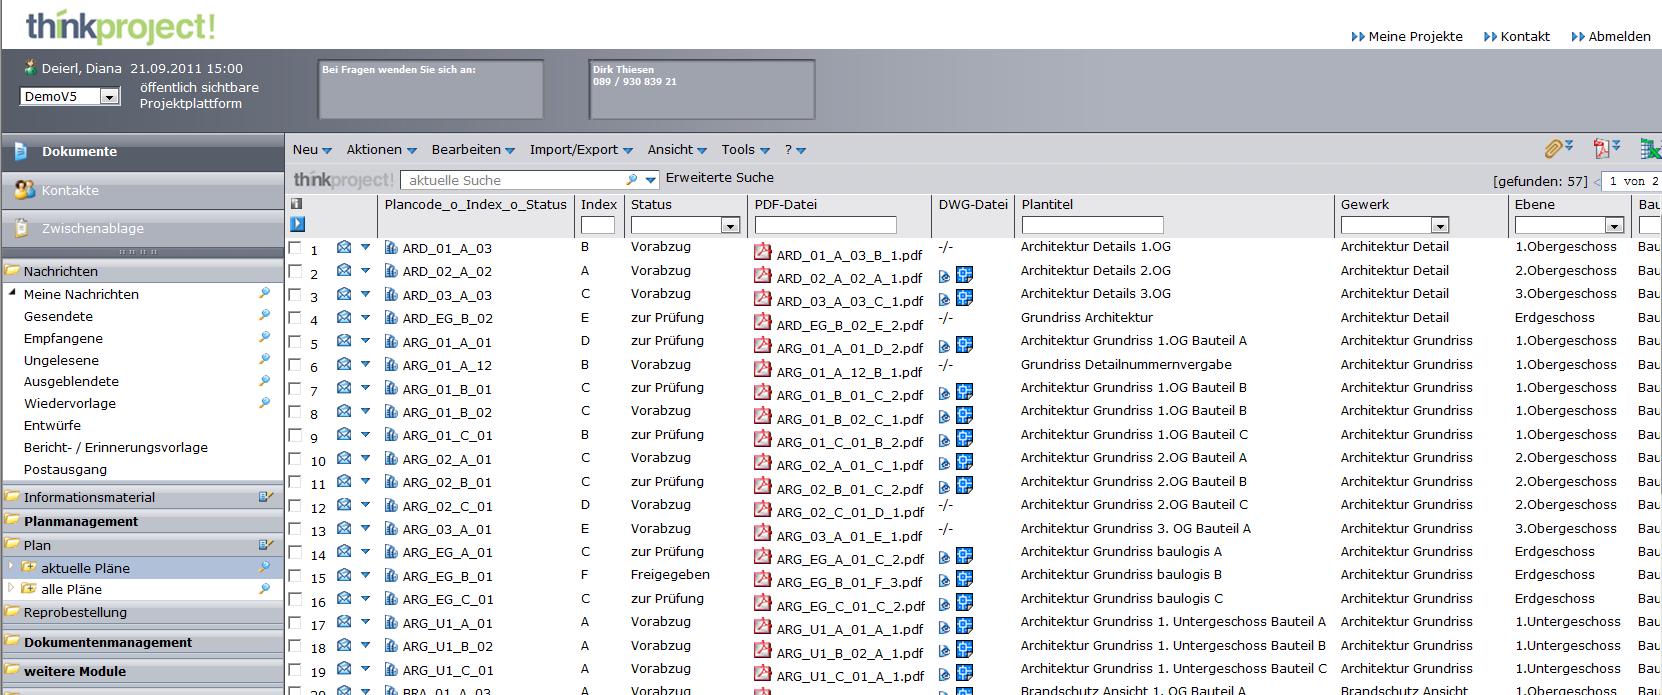 Screenshot: think project! in der Version 6.0